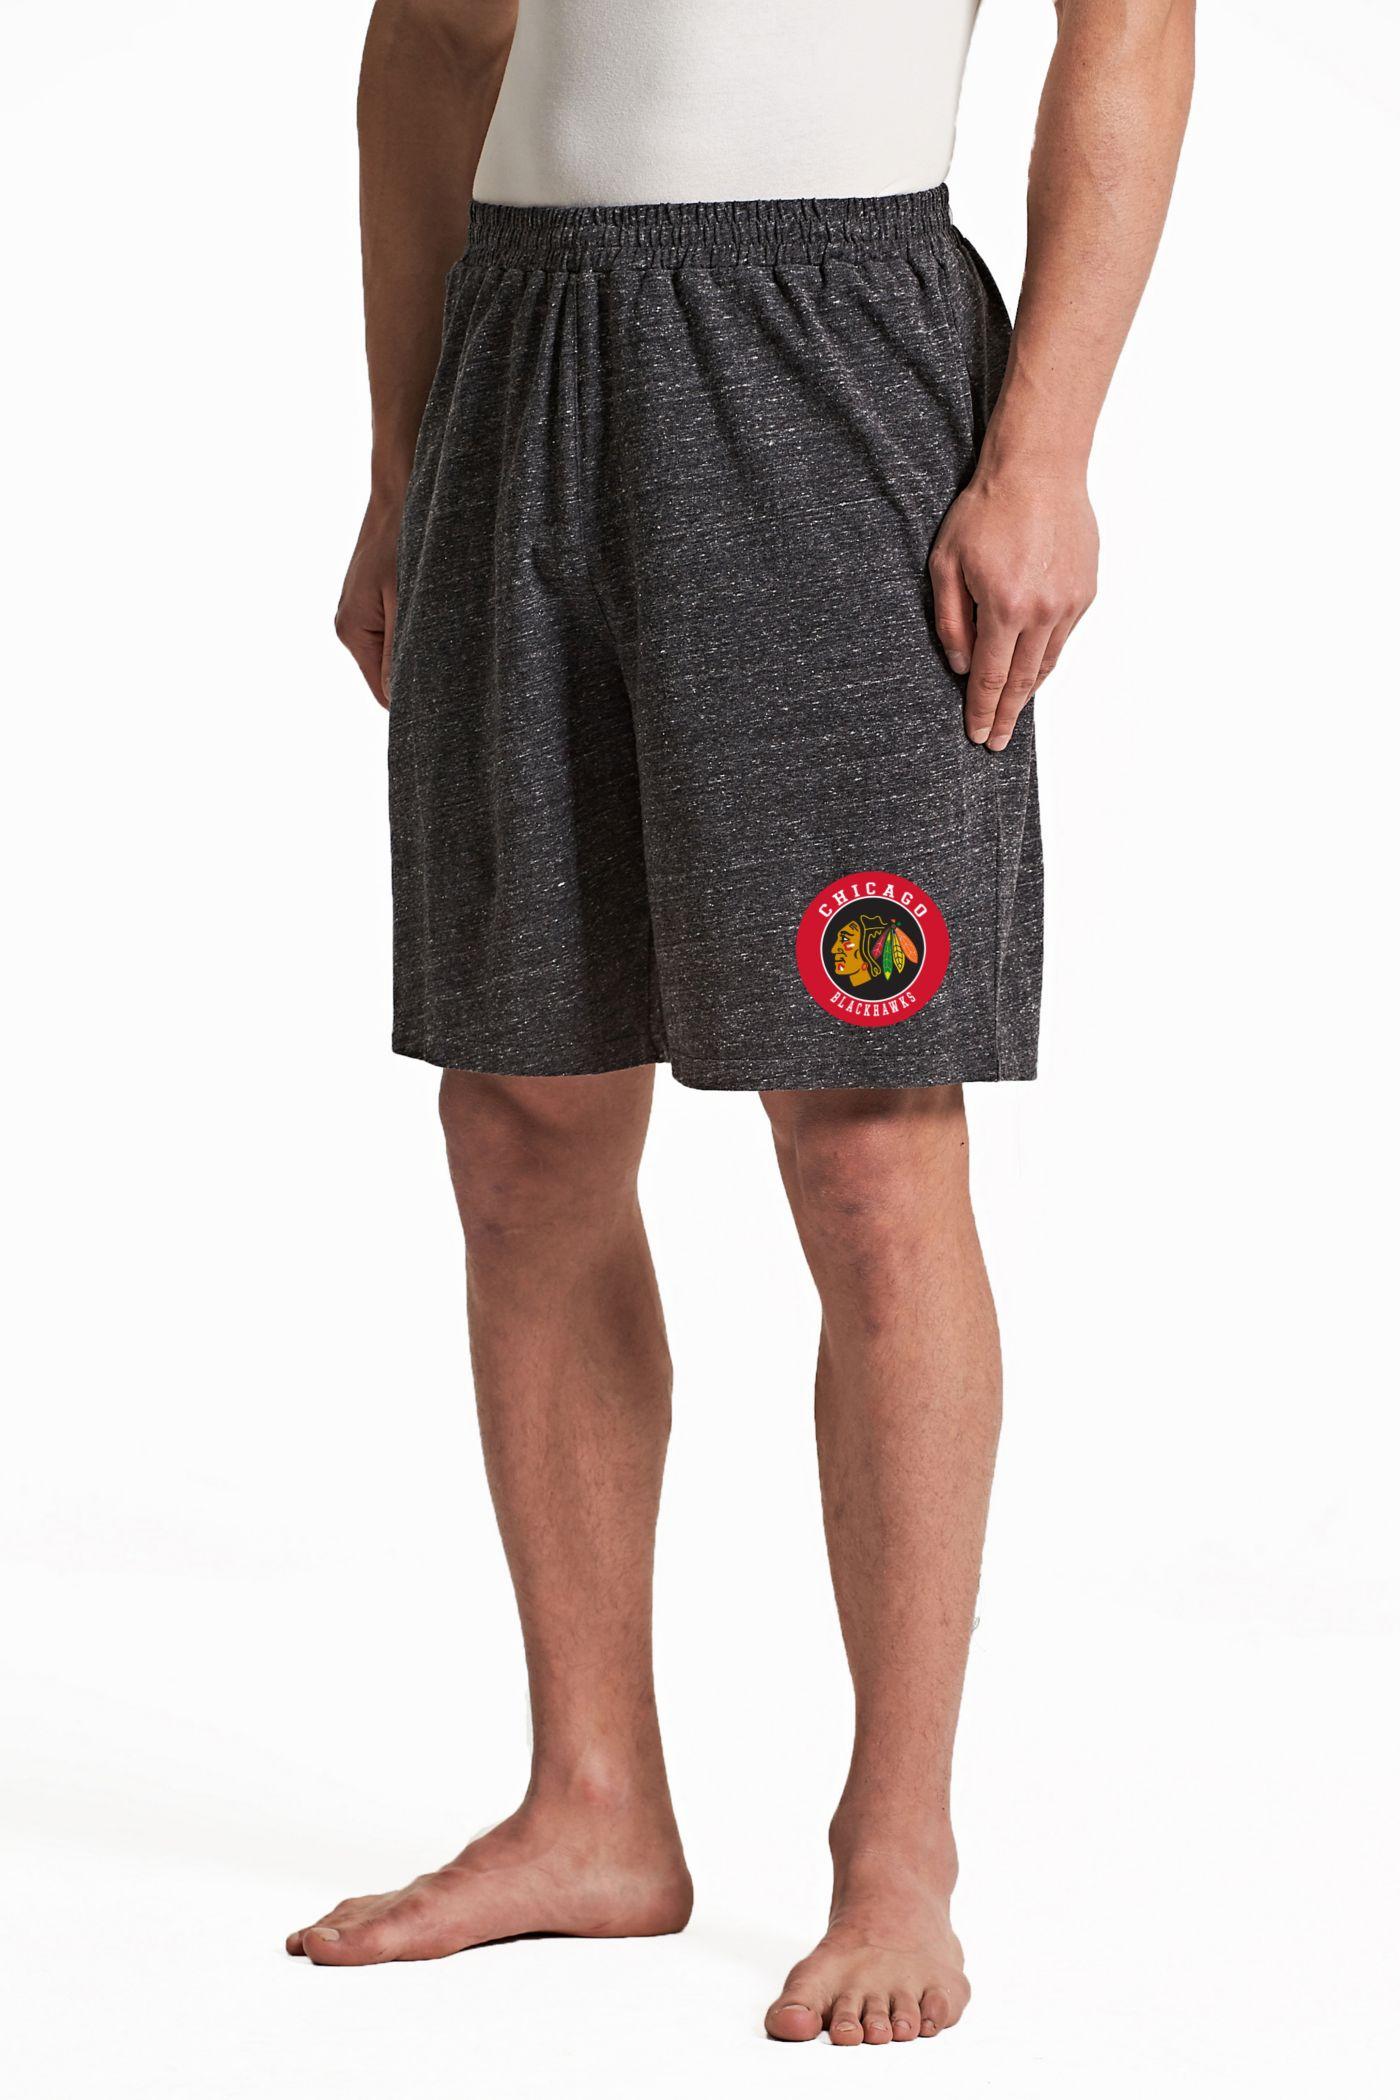 Concepts Sport Men's Chicago Blackhawks Pitch Grey Shorts